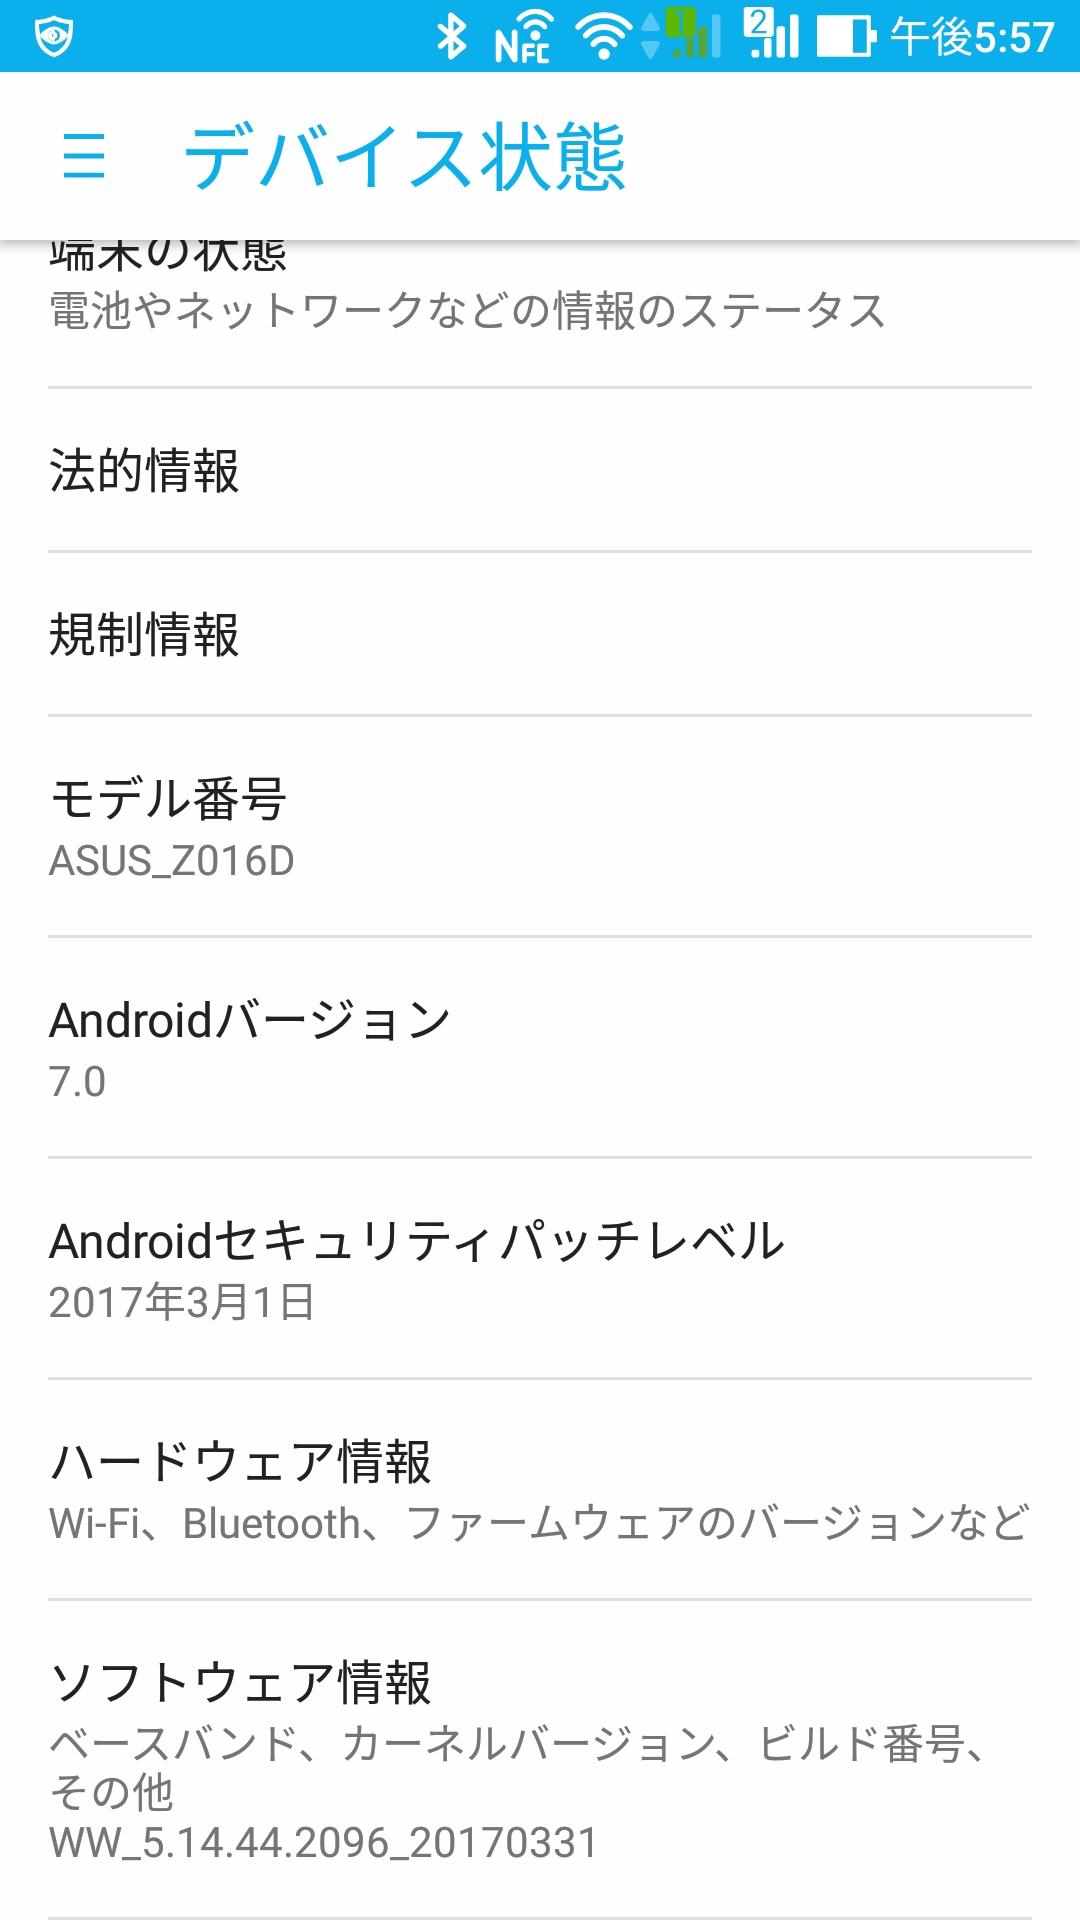 Zenfone 3 Deluxe(5.7インチ)2017年4月末時点の最新ソフトへのアップデートは、特に不具合の発生なし!